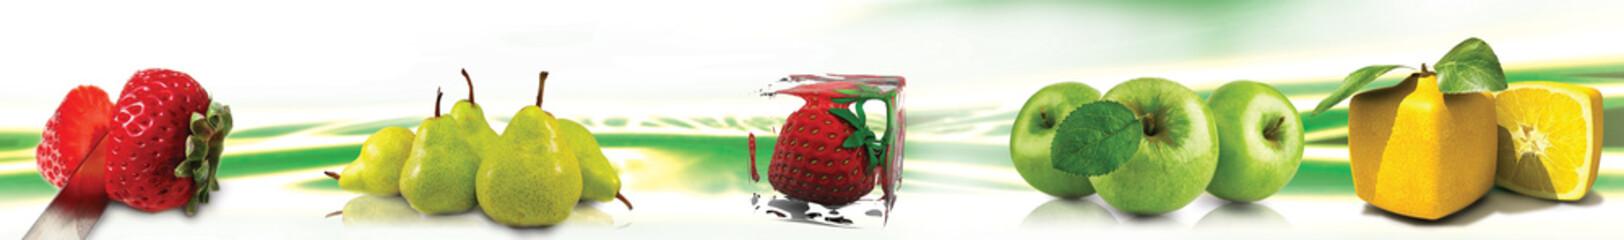 owoce_zestaw